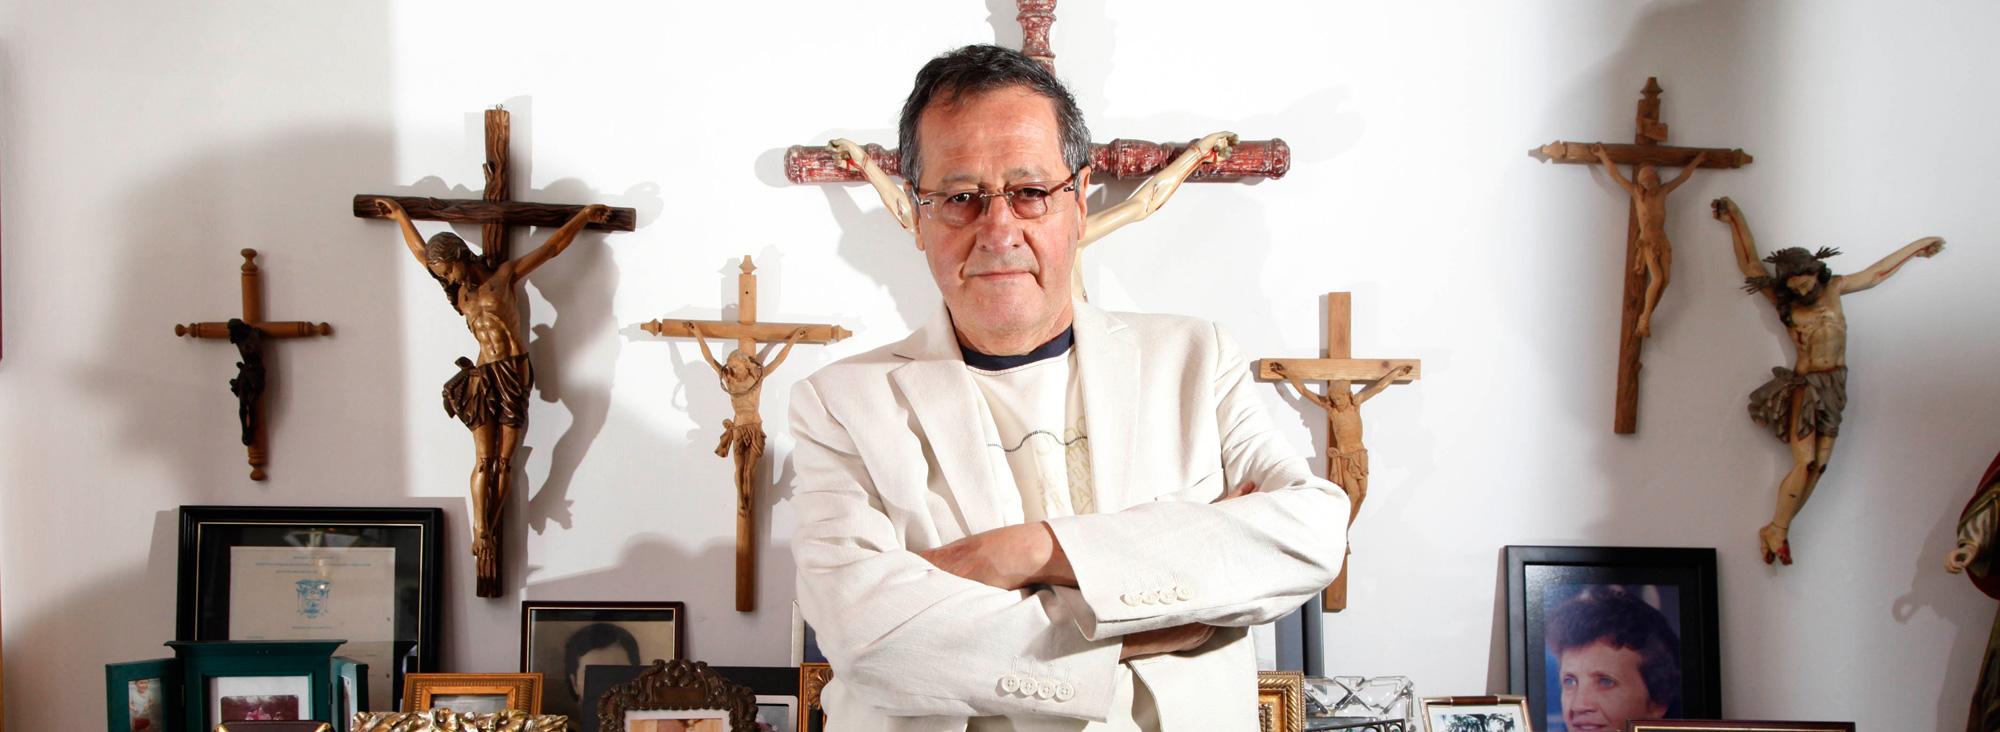 Pedro Restrepo 3